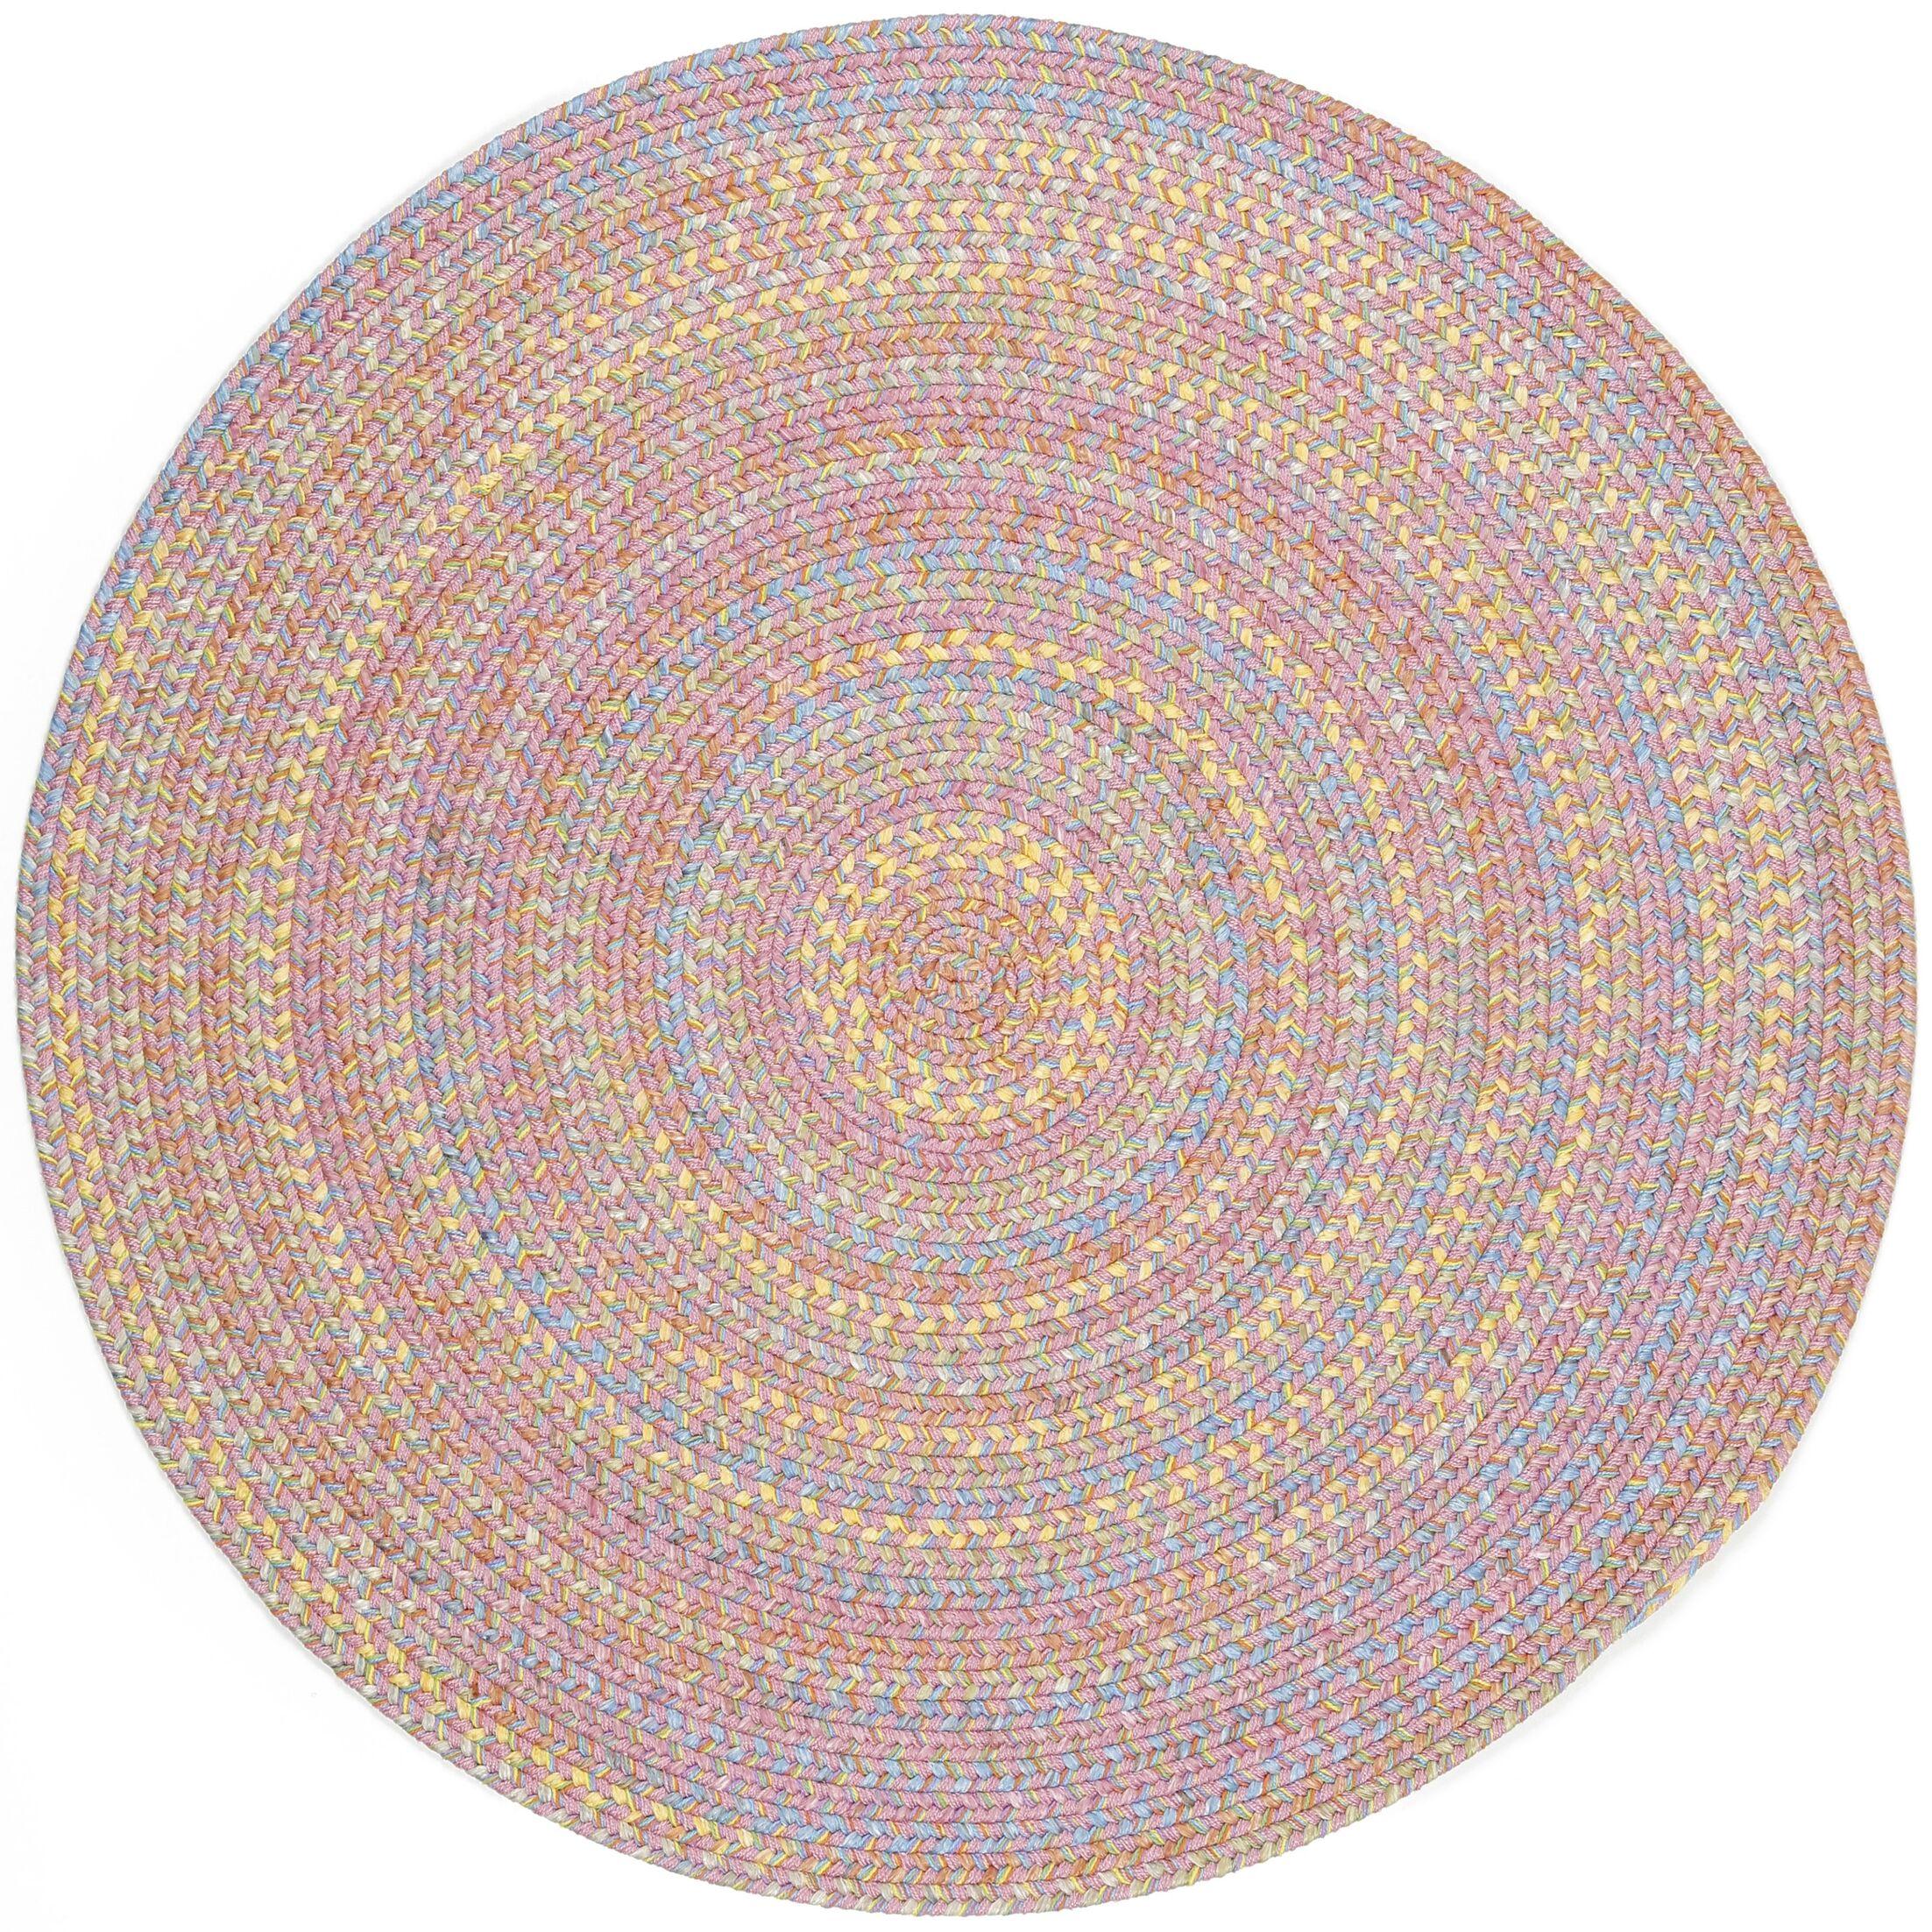 Saidpur Pink Indoor/Outdoor Area Rug Rug Size: Round 6'